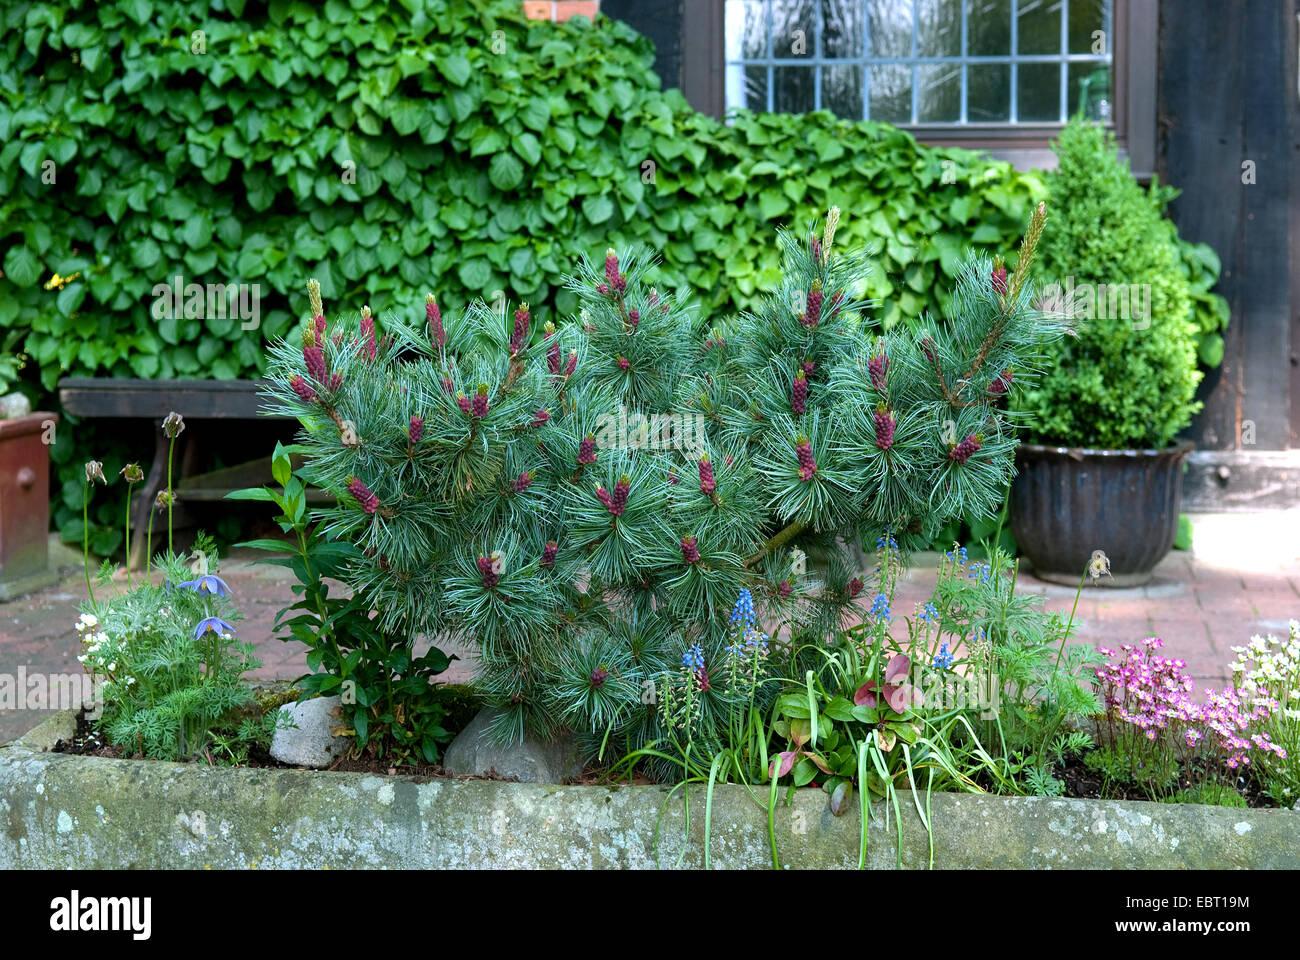 Japanese white pine (Pinus parviflora 'Negishi', Pinus parviflora Negishi), cultivar Negishi - Stock Image